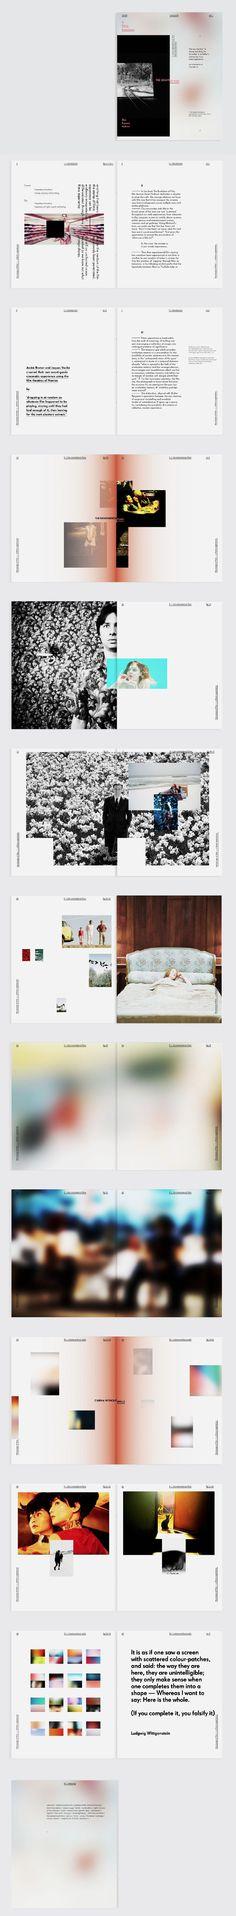 Layout Design: Minimal layout, evident use of text, good balance between photos & texts (https://s-media-cache-ak0.pinimg.com/originals/45/56/0b/45560b300c242911384b2afddab79c37.jpg)